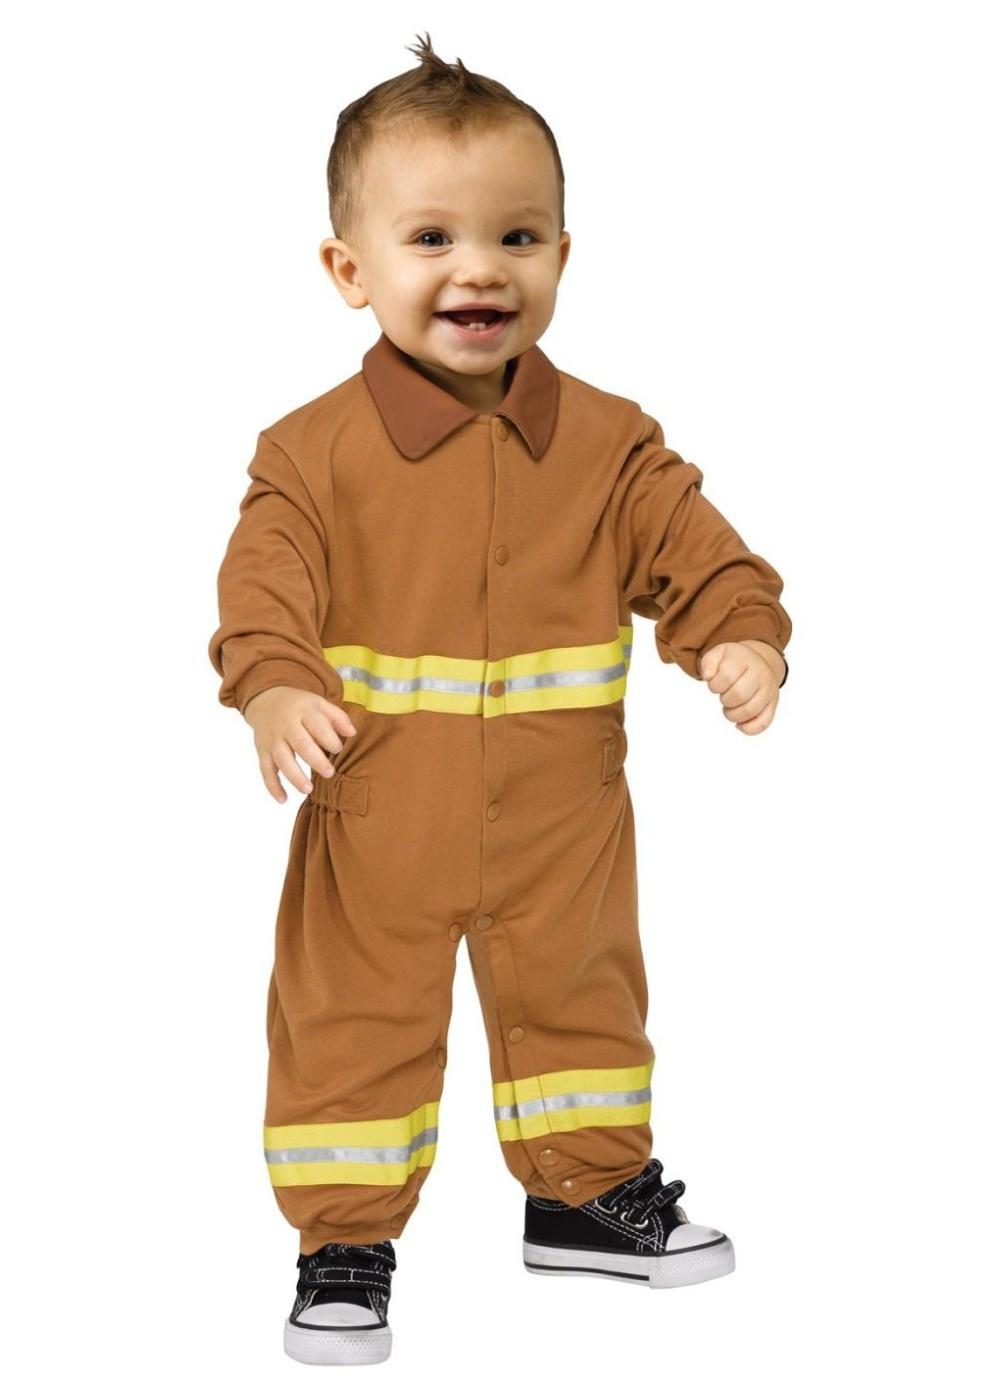 Fireman Baby Costume Professional Costumes